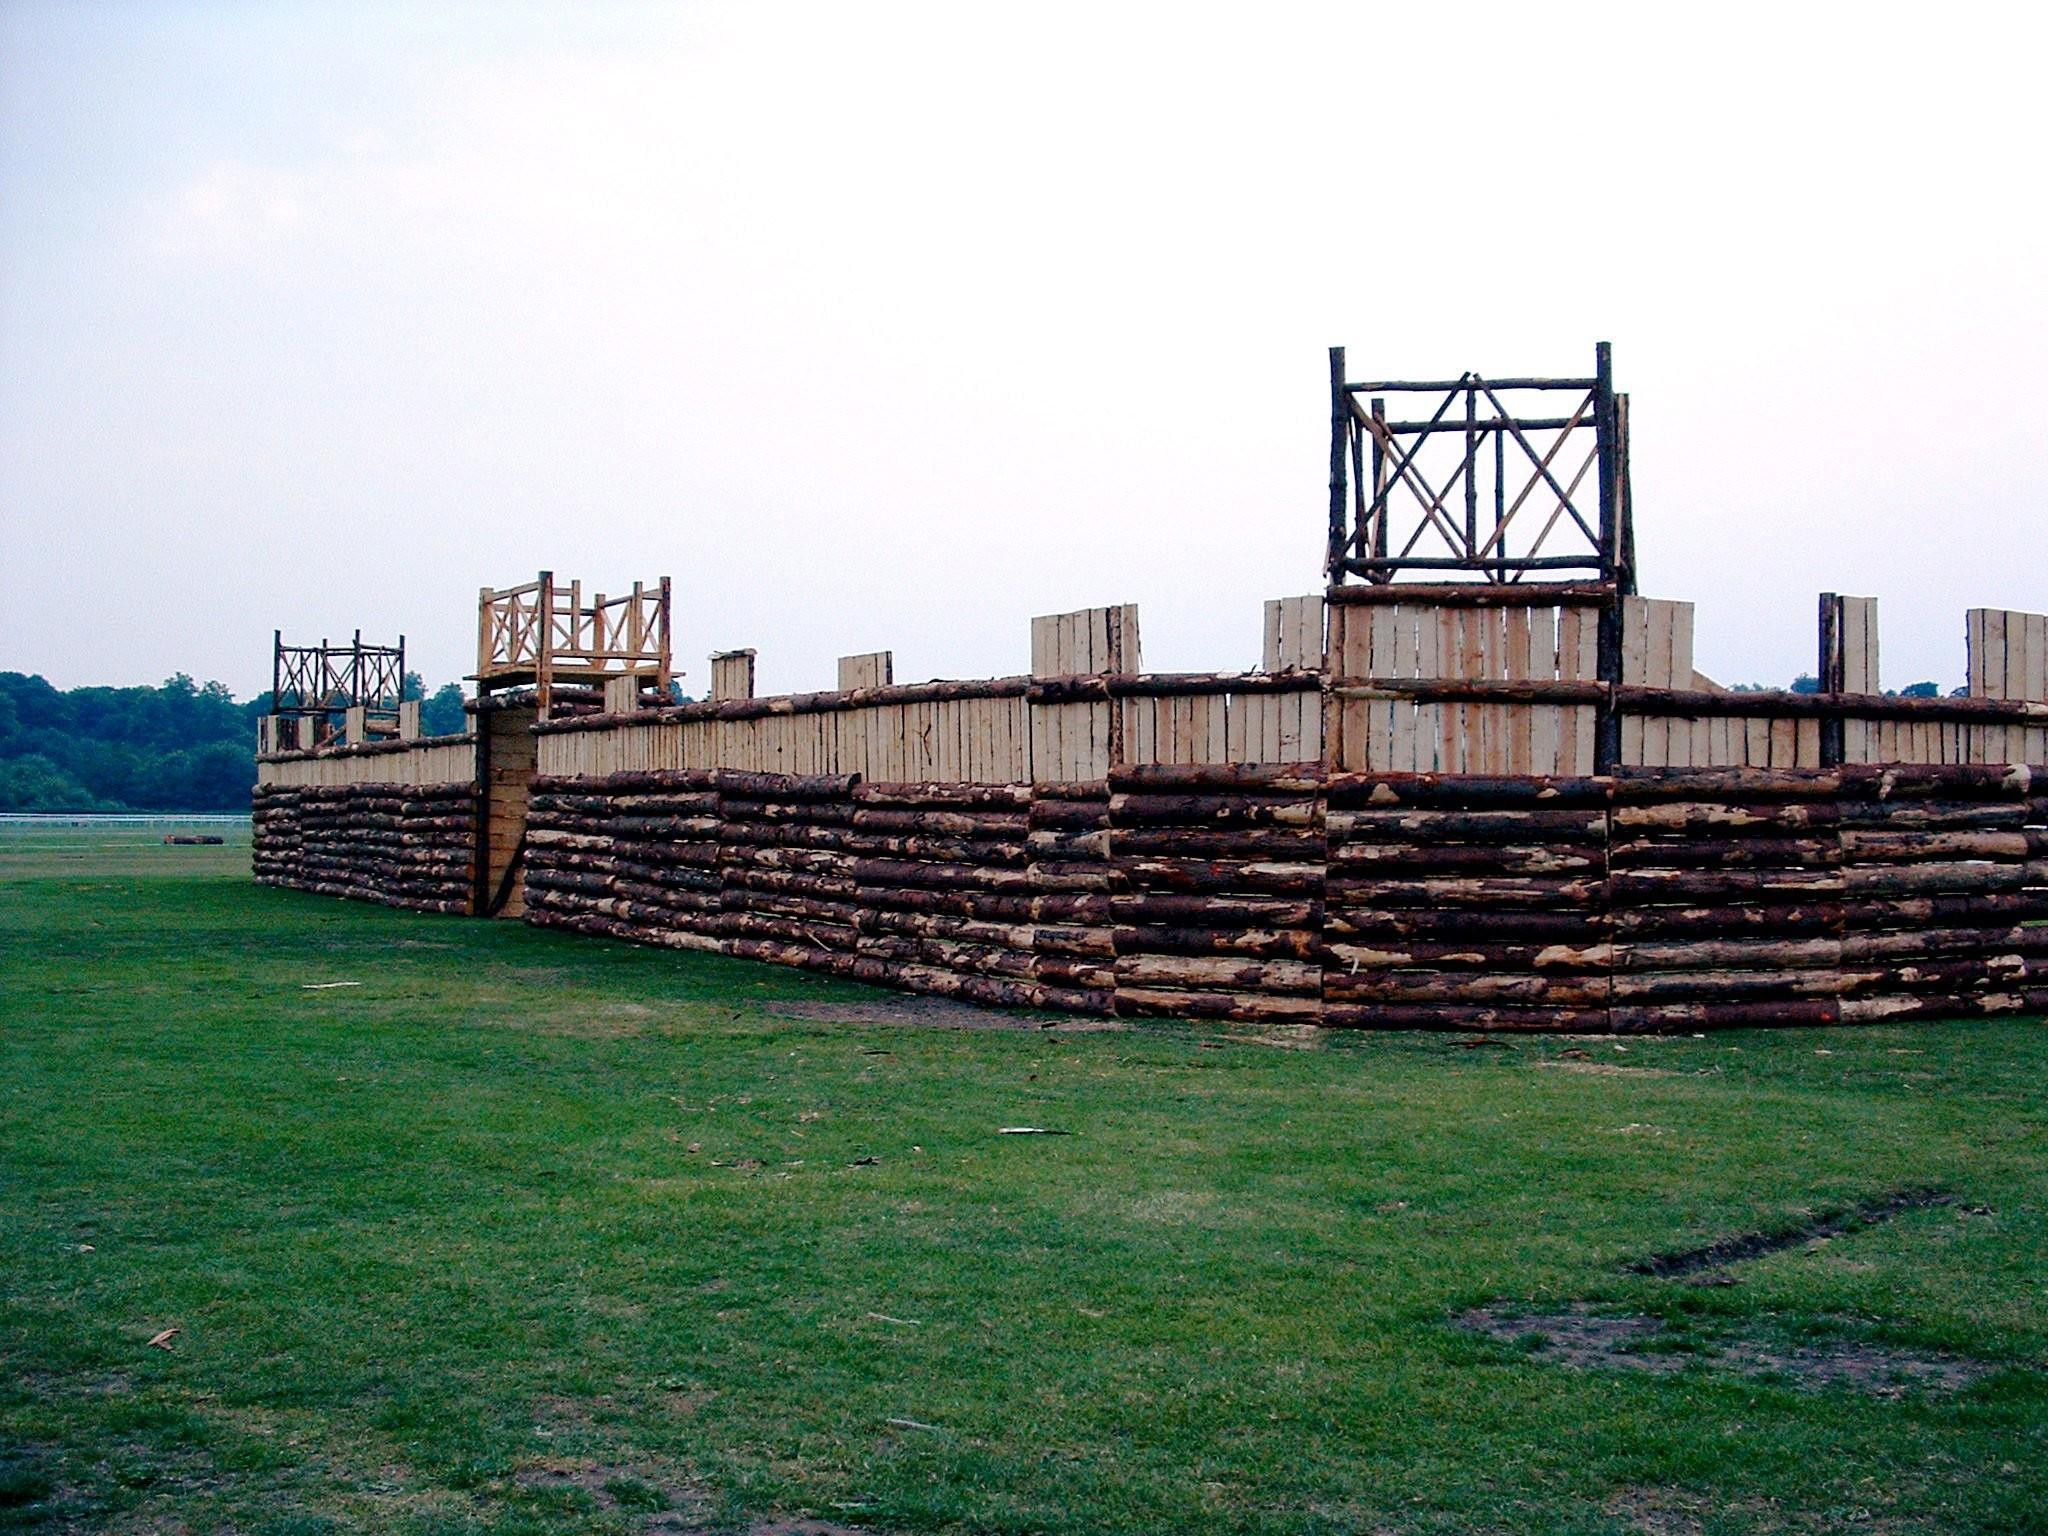 fort gate 259578_10150278171586343_597511342_9300795_1079514_o